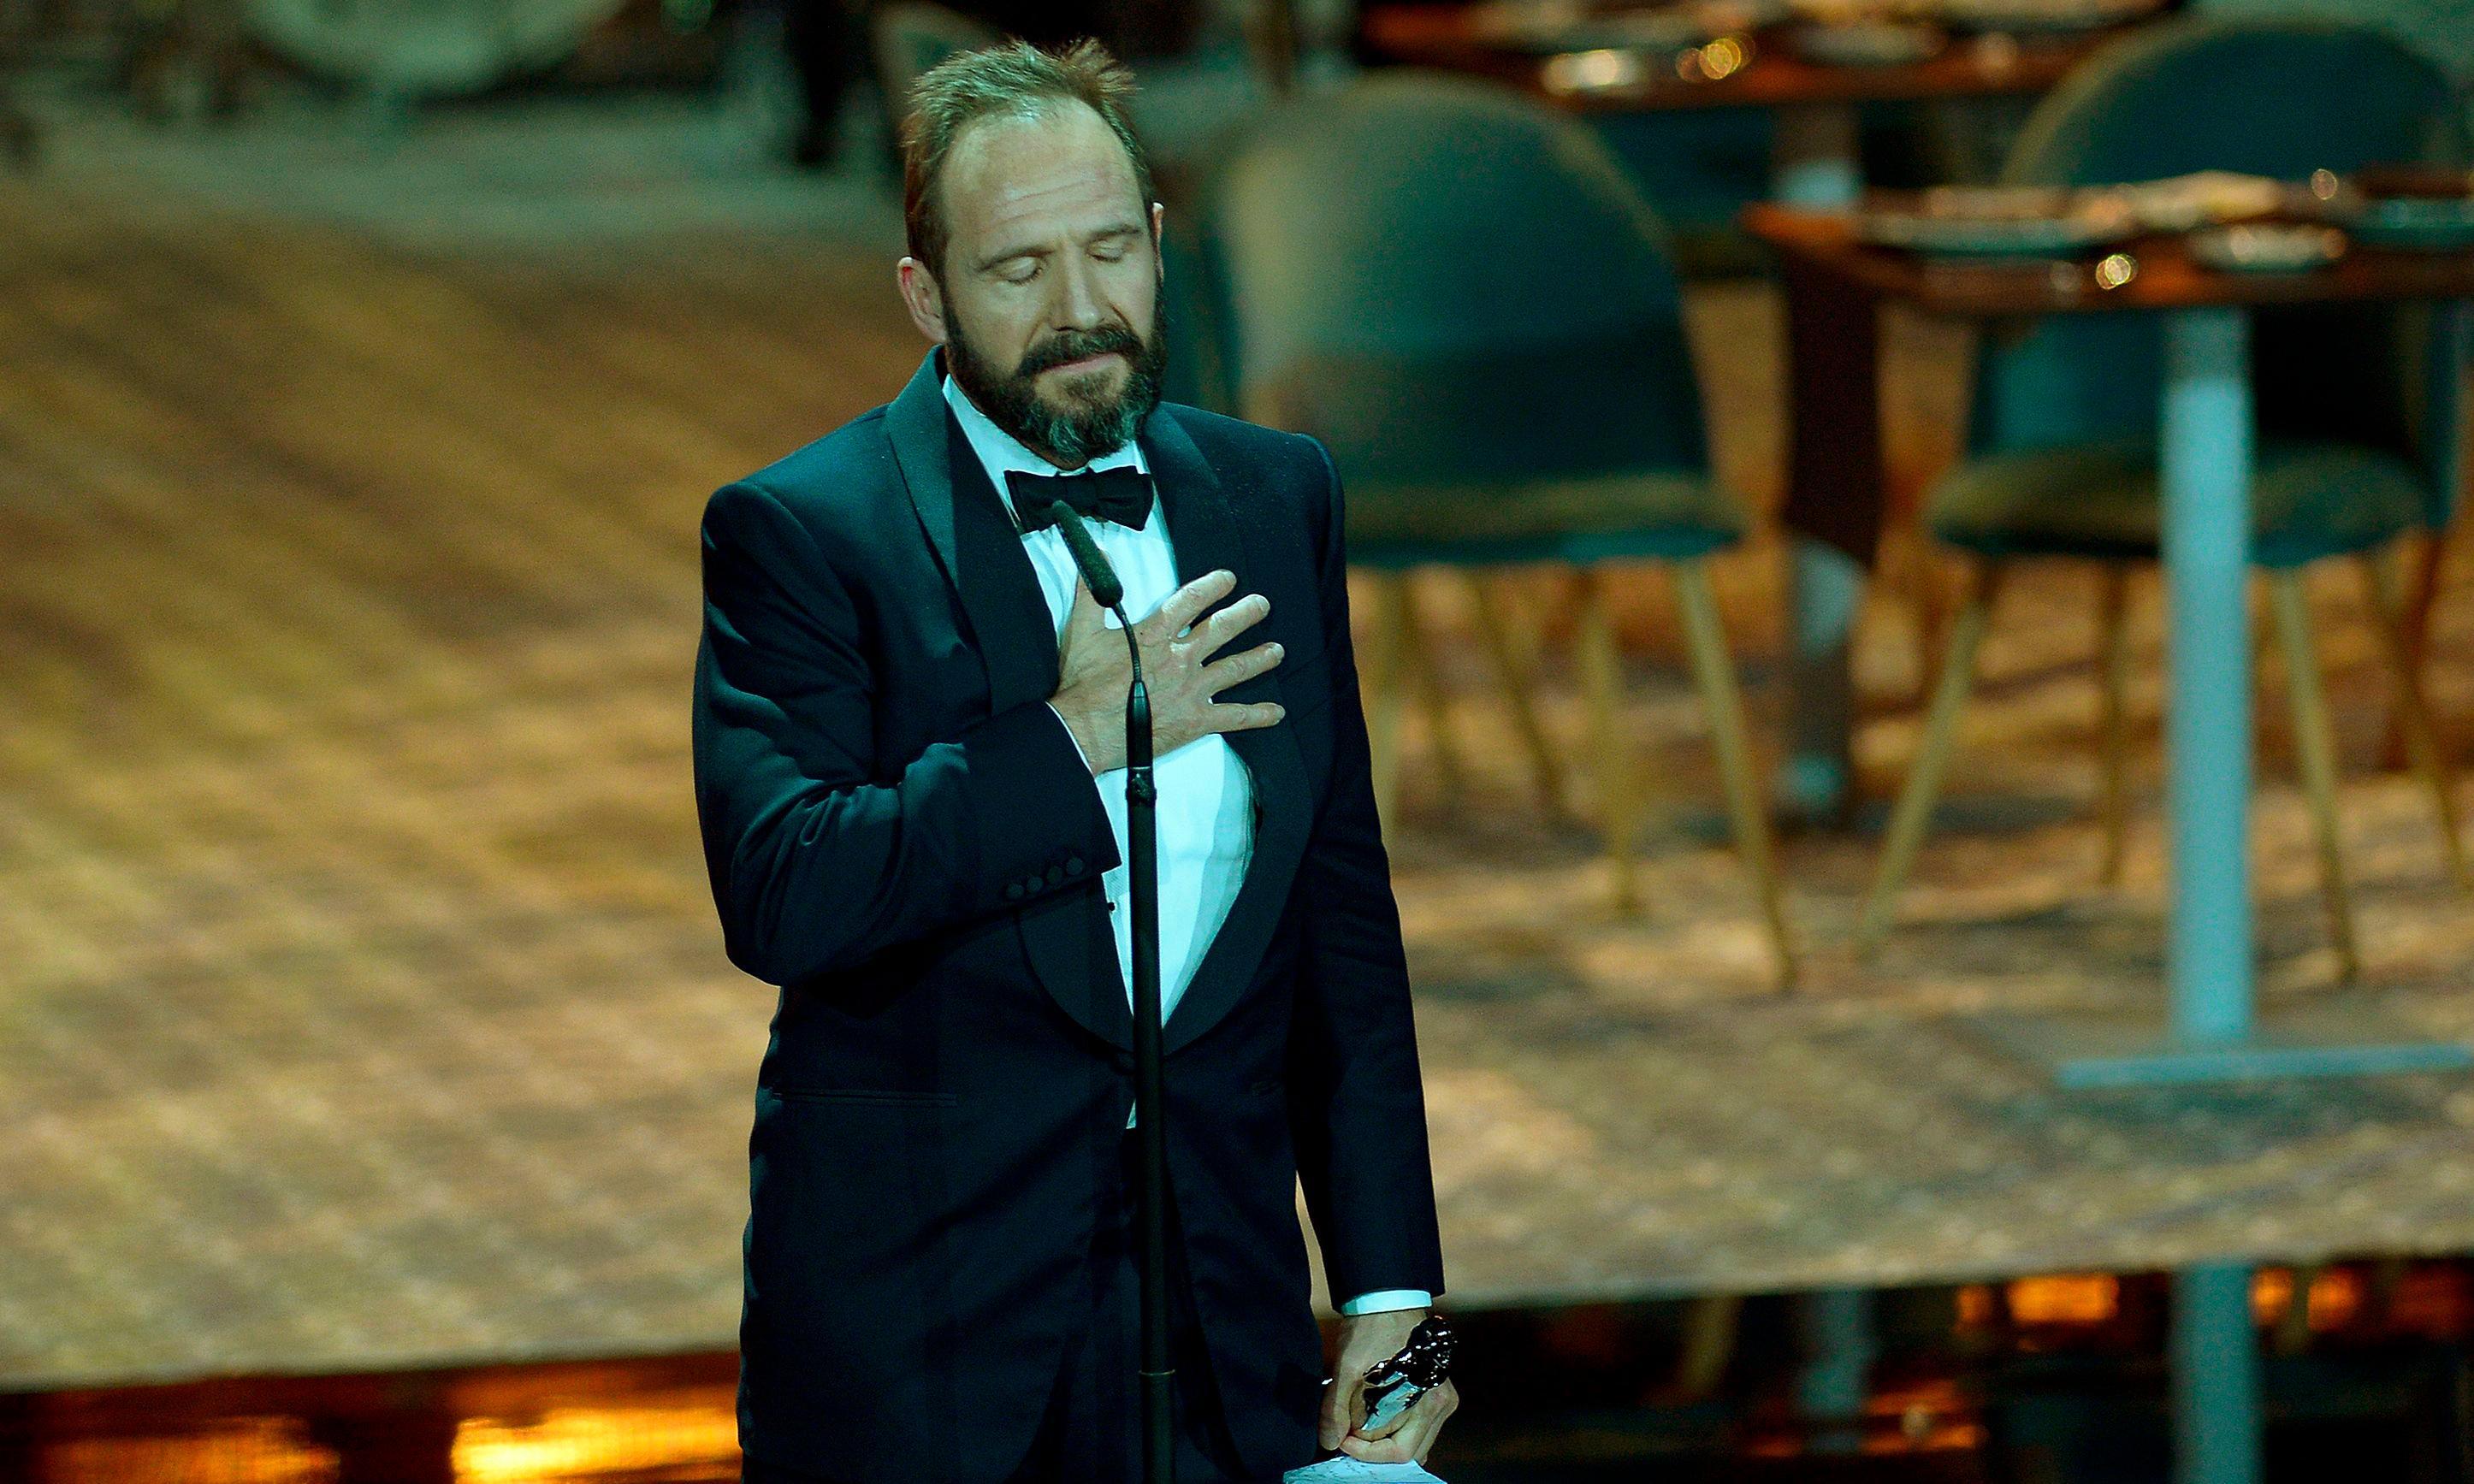 'Distressing and depressing': stars bemoan Brexit at European film awards